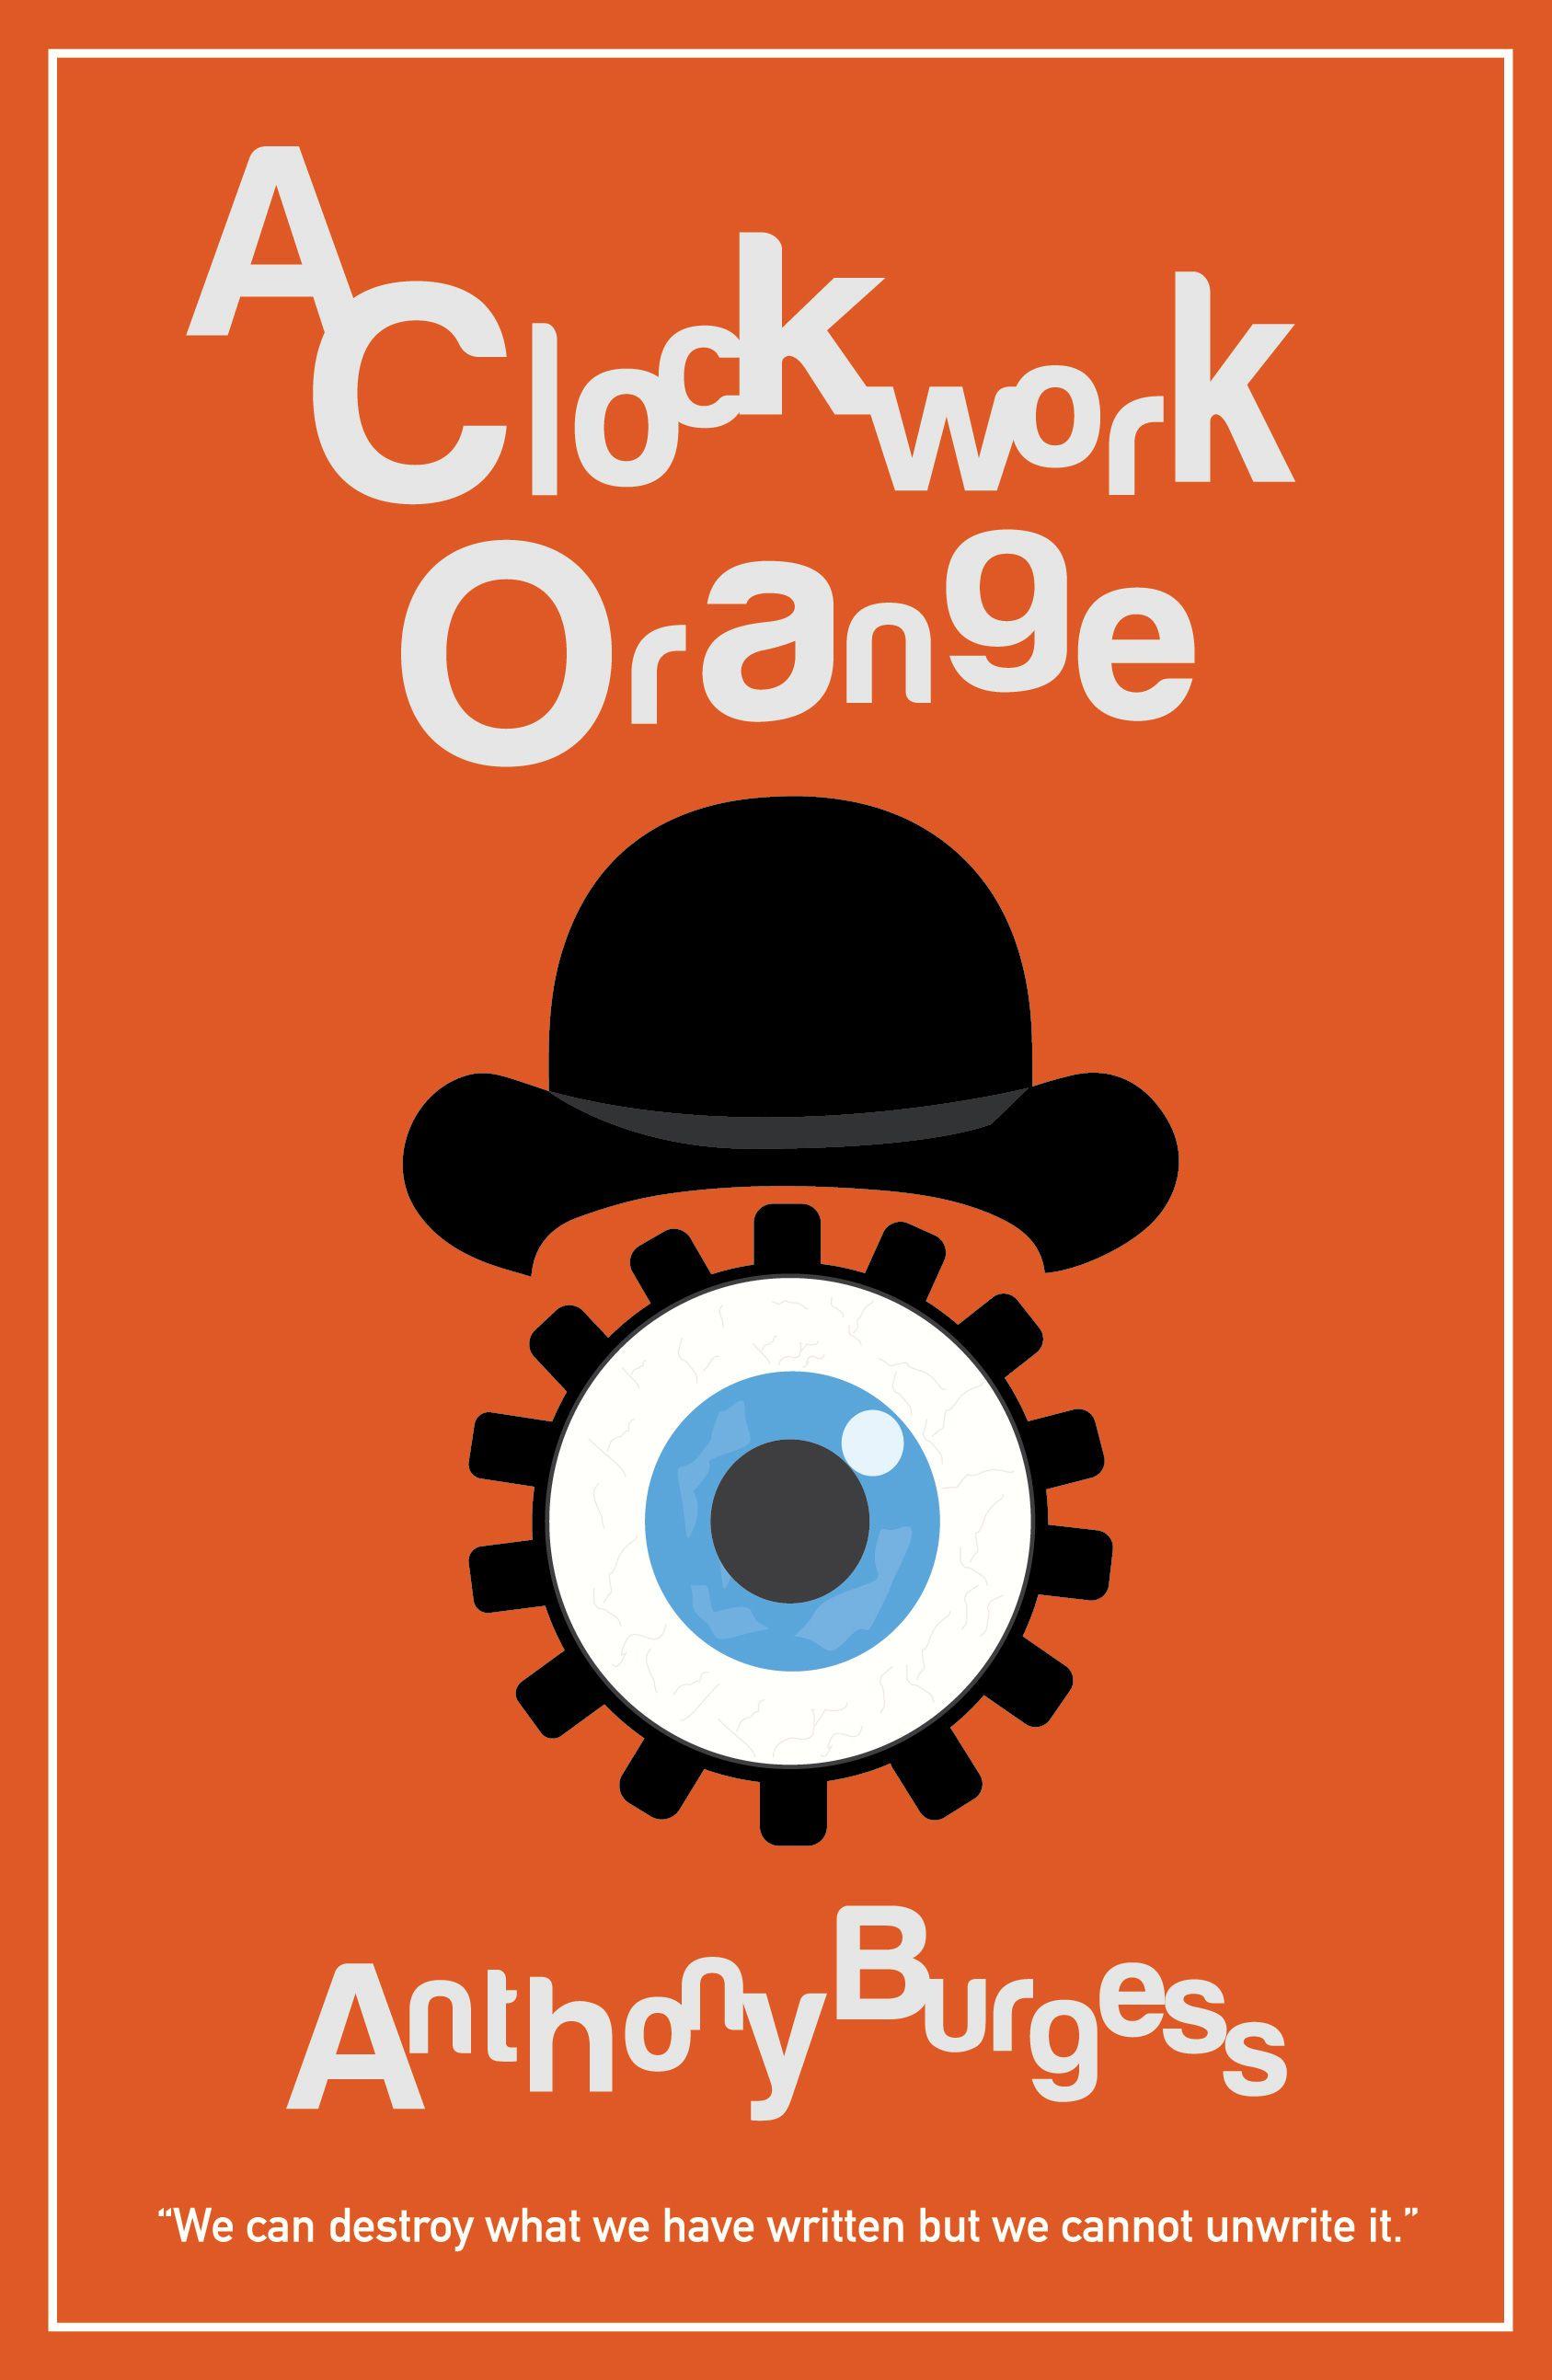 A Clockwork Orange by Anthony Burgess Book Poster, 2020